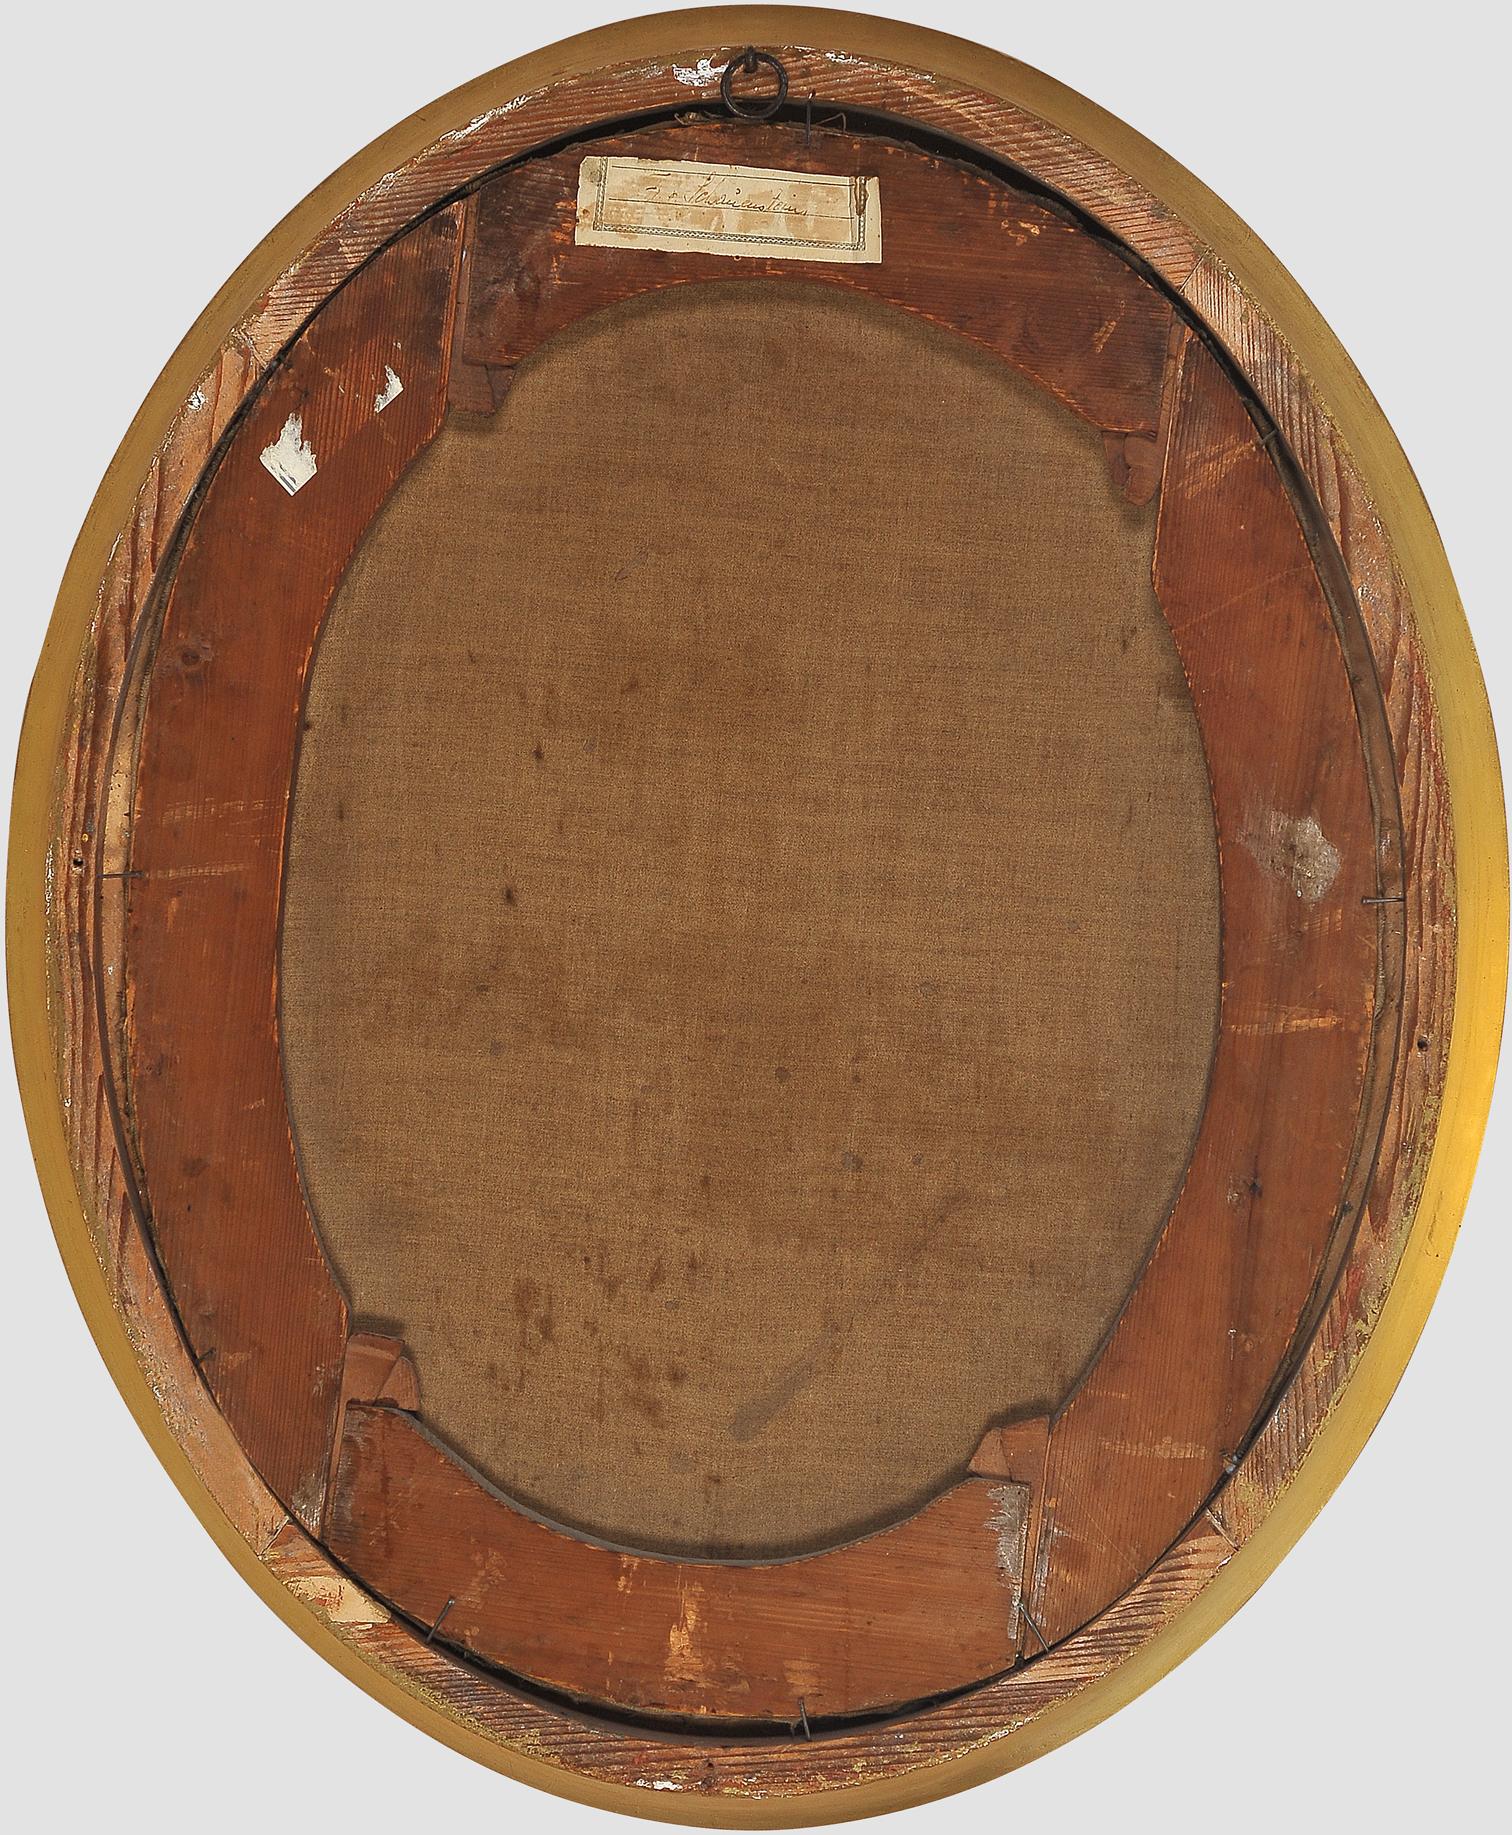 "Nicolas Guy Brenet, Paris 1728 – 1792 Paris, Portraits des Ehepaares ""Von Schauenstein"" - Image 11 of 11"